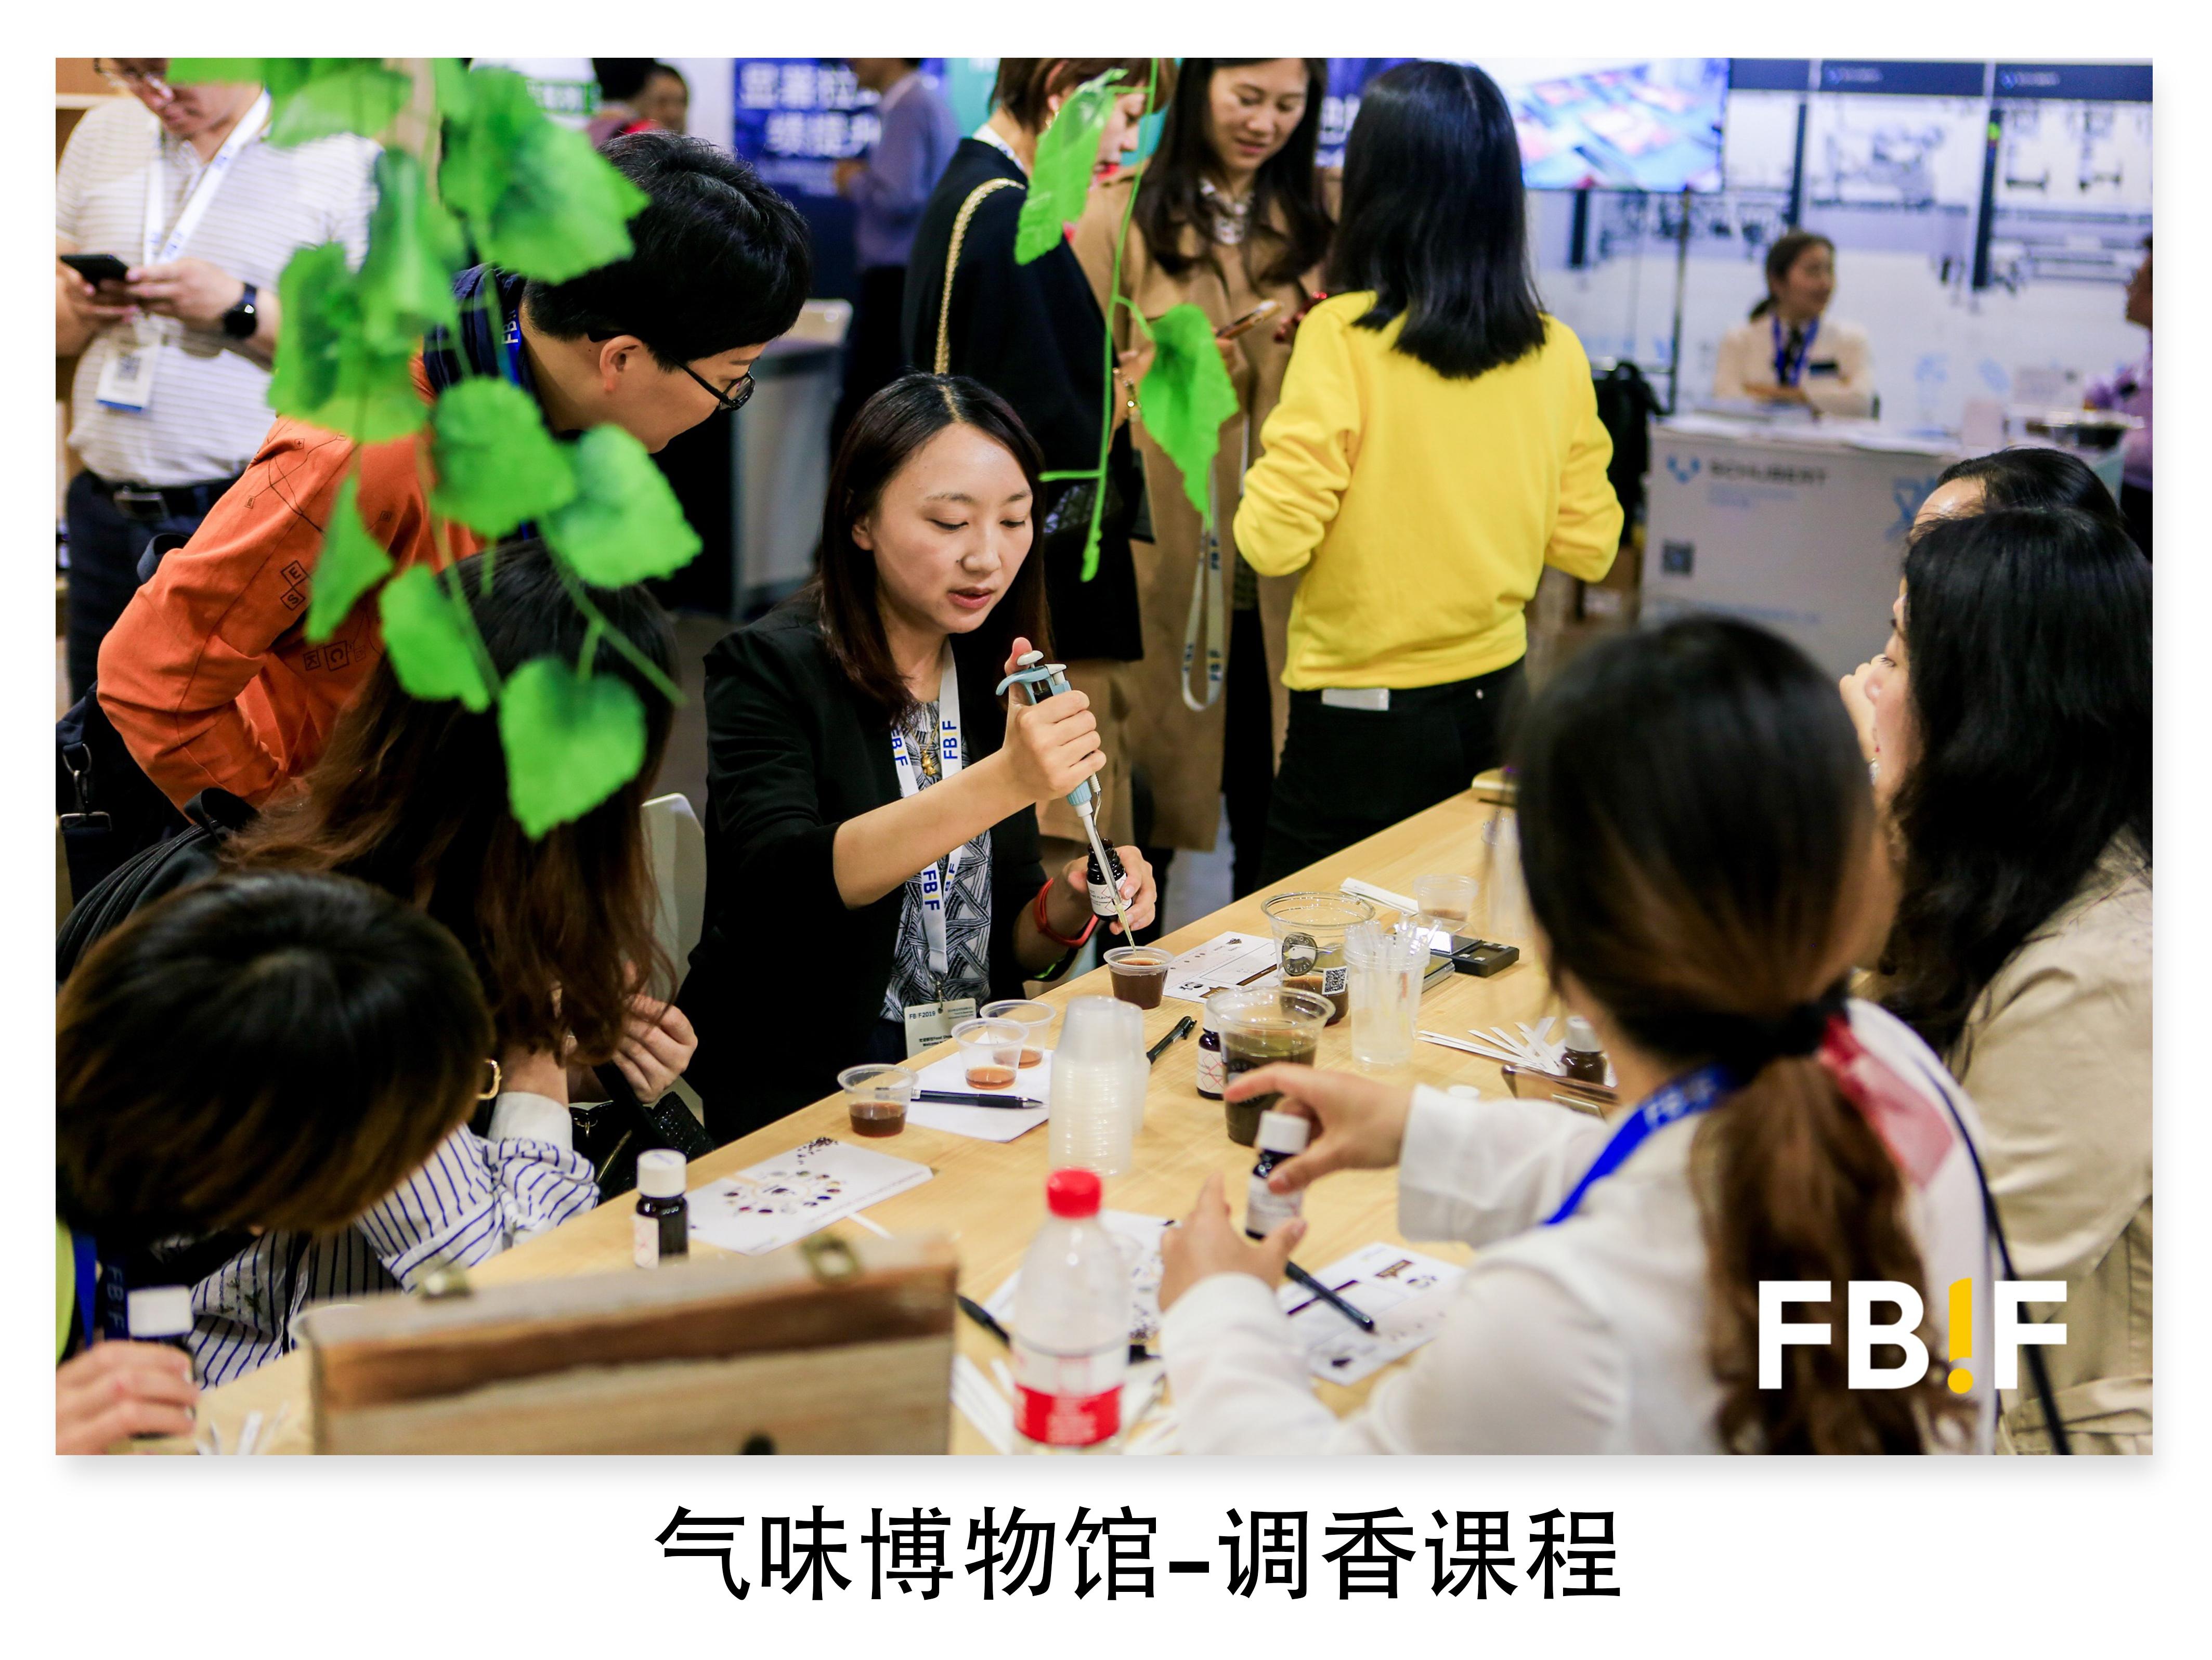 FBIF 2020食品饮料创新论坛(杭州)